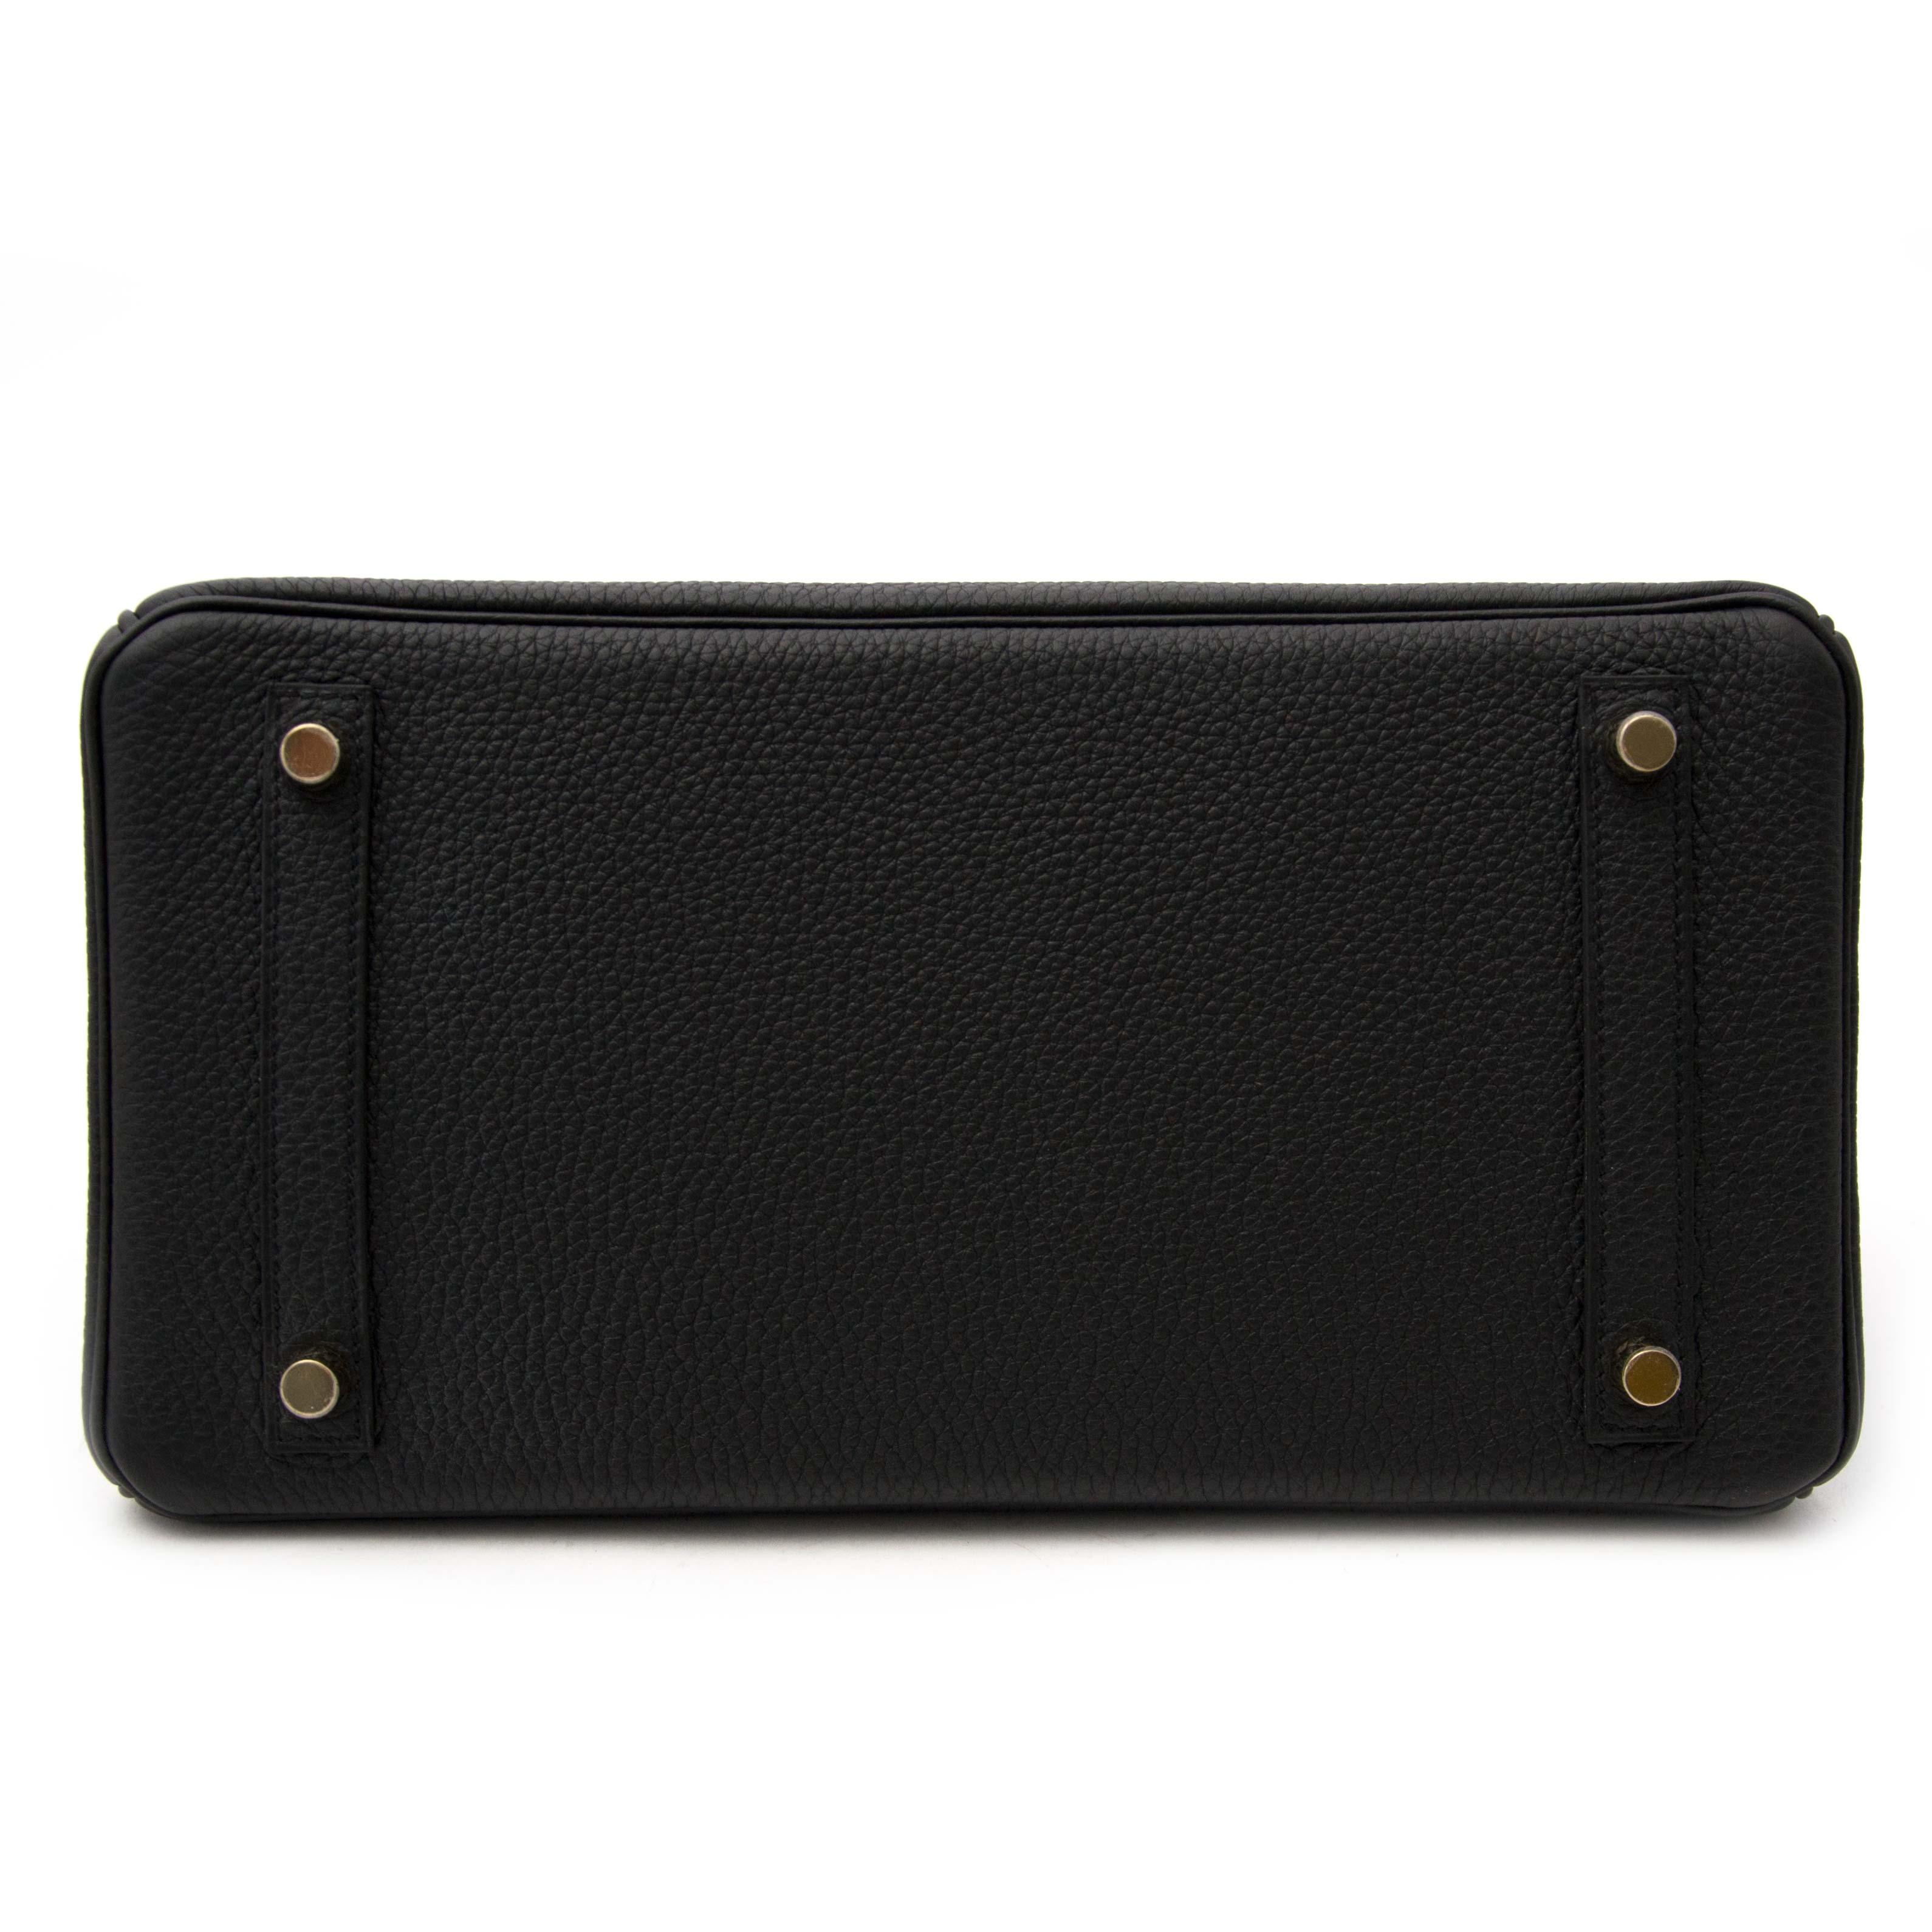 a068eb4c41b Hermès Birkin 30 Togo Black GHW For Sale at 1stdibs